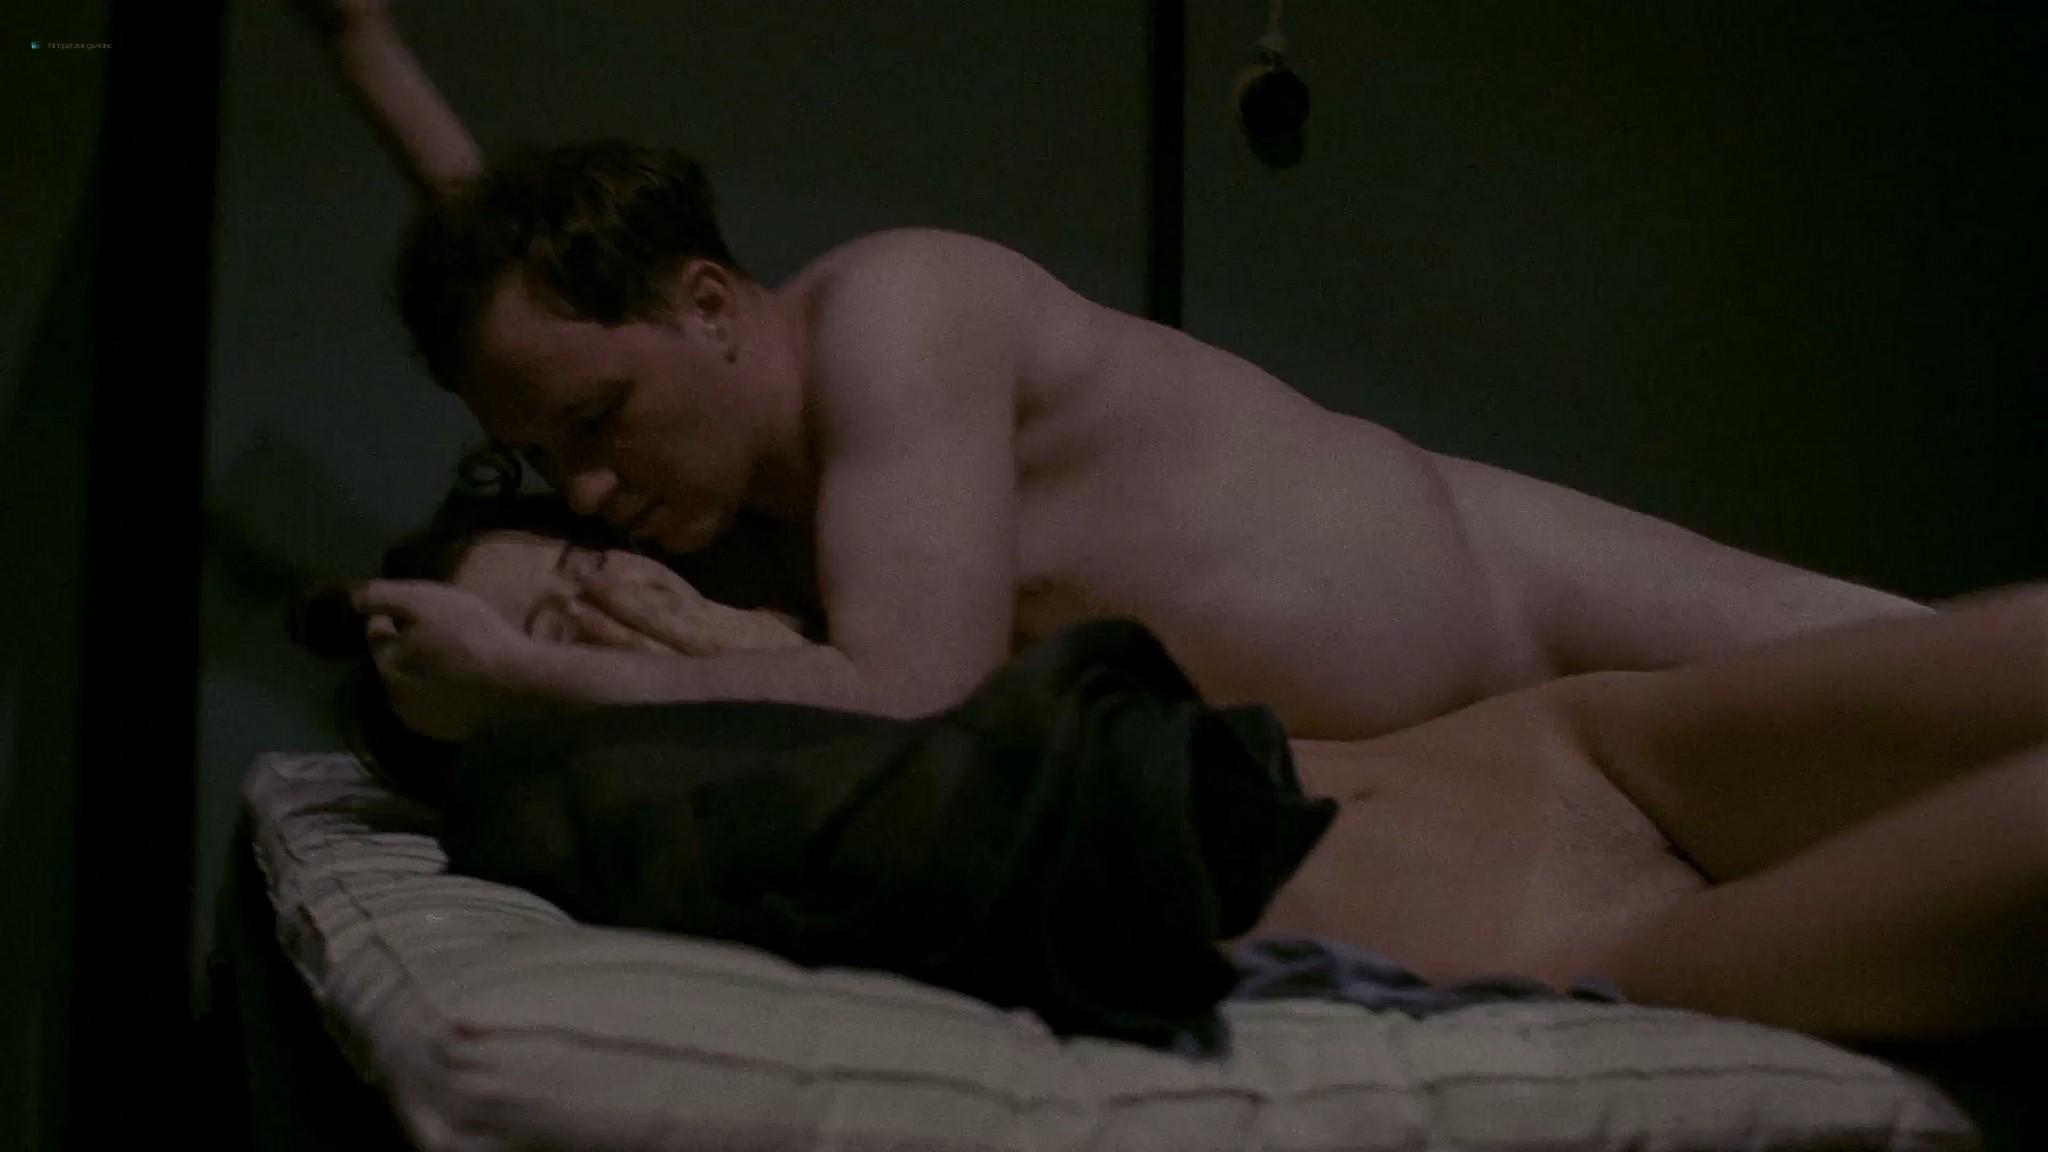 Ekaterina Yuspina nude explicit sex Tatyana Polozhiy, Radmila Shegoleva nude sex too - DAU Katya Tanya (2020) HD 1080p (11)